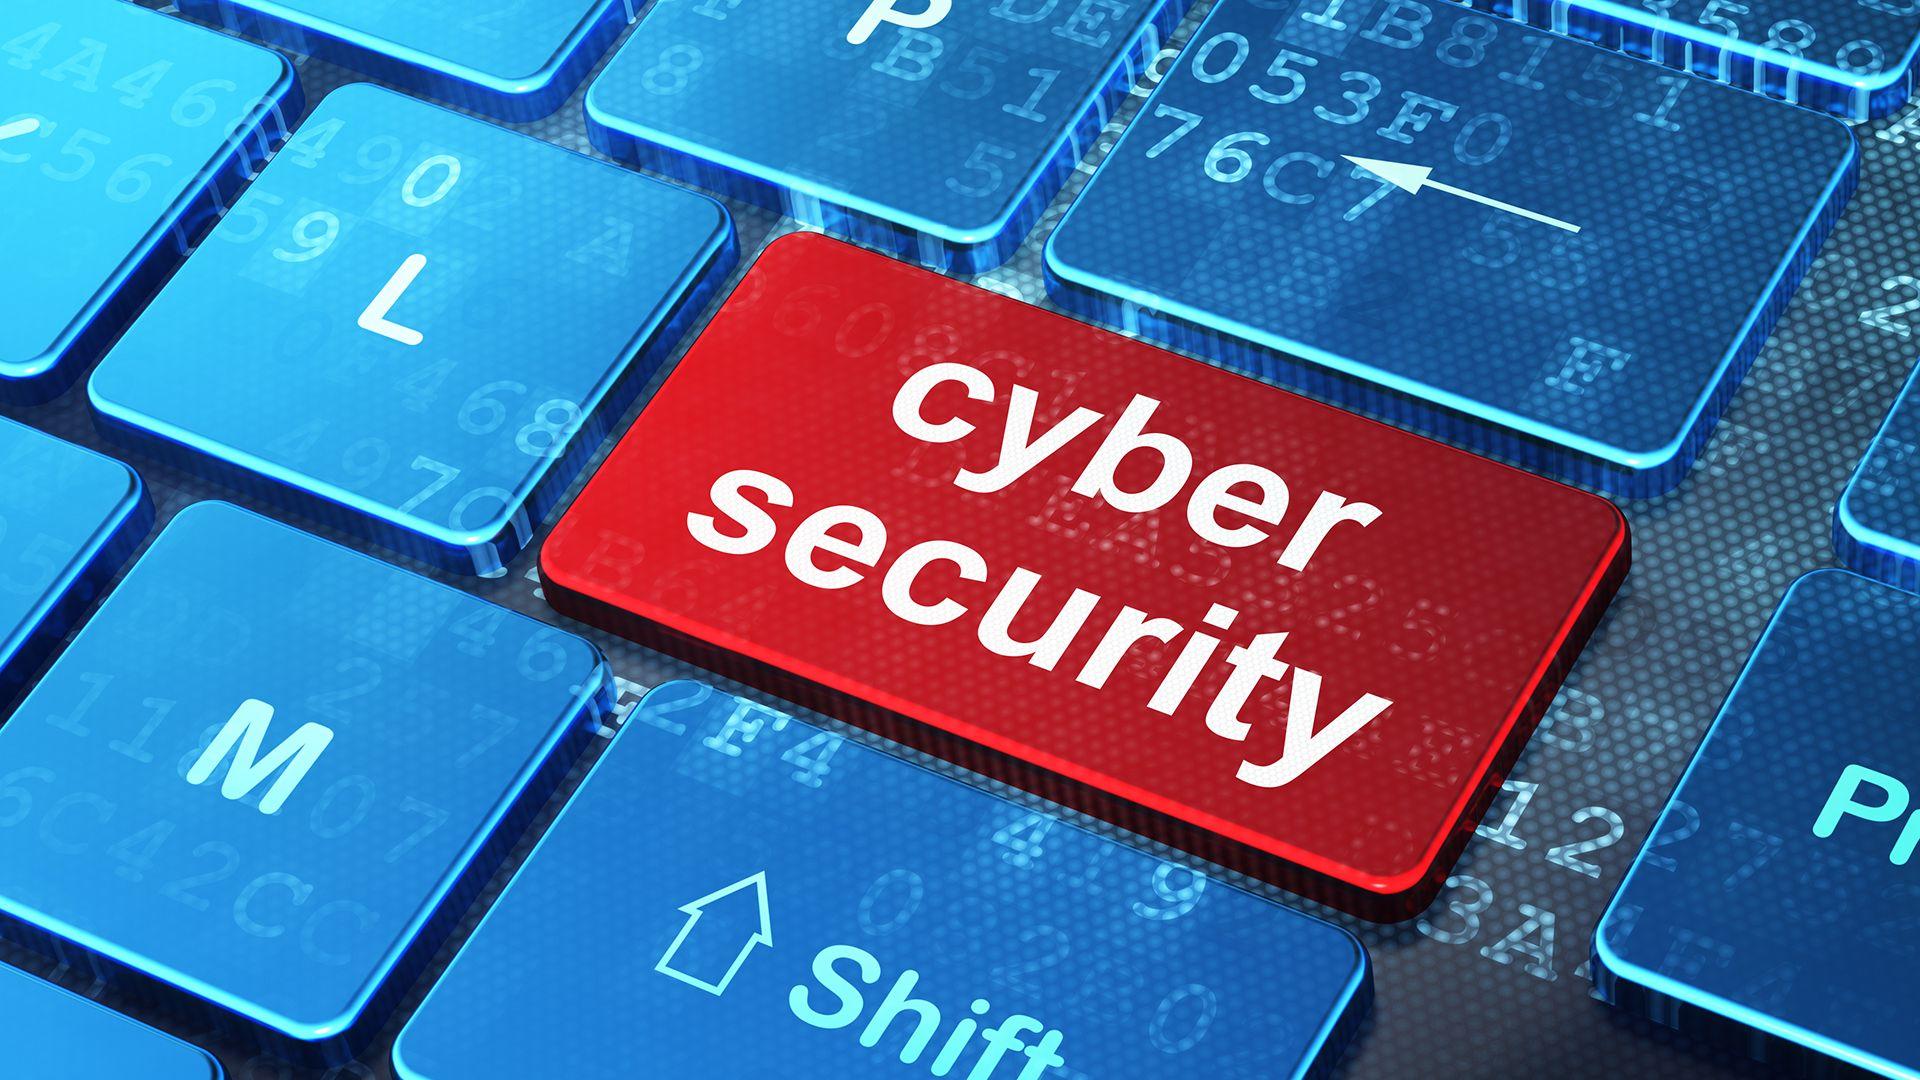 Charles Sturt boosts NSW Cyber Security Network - CSU News